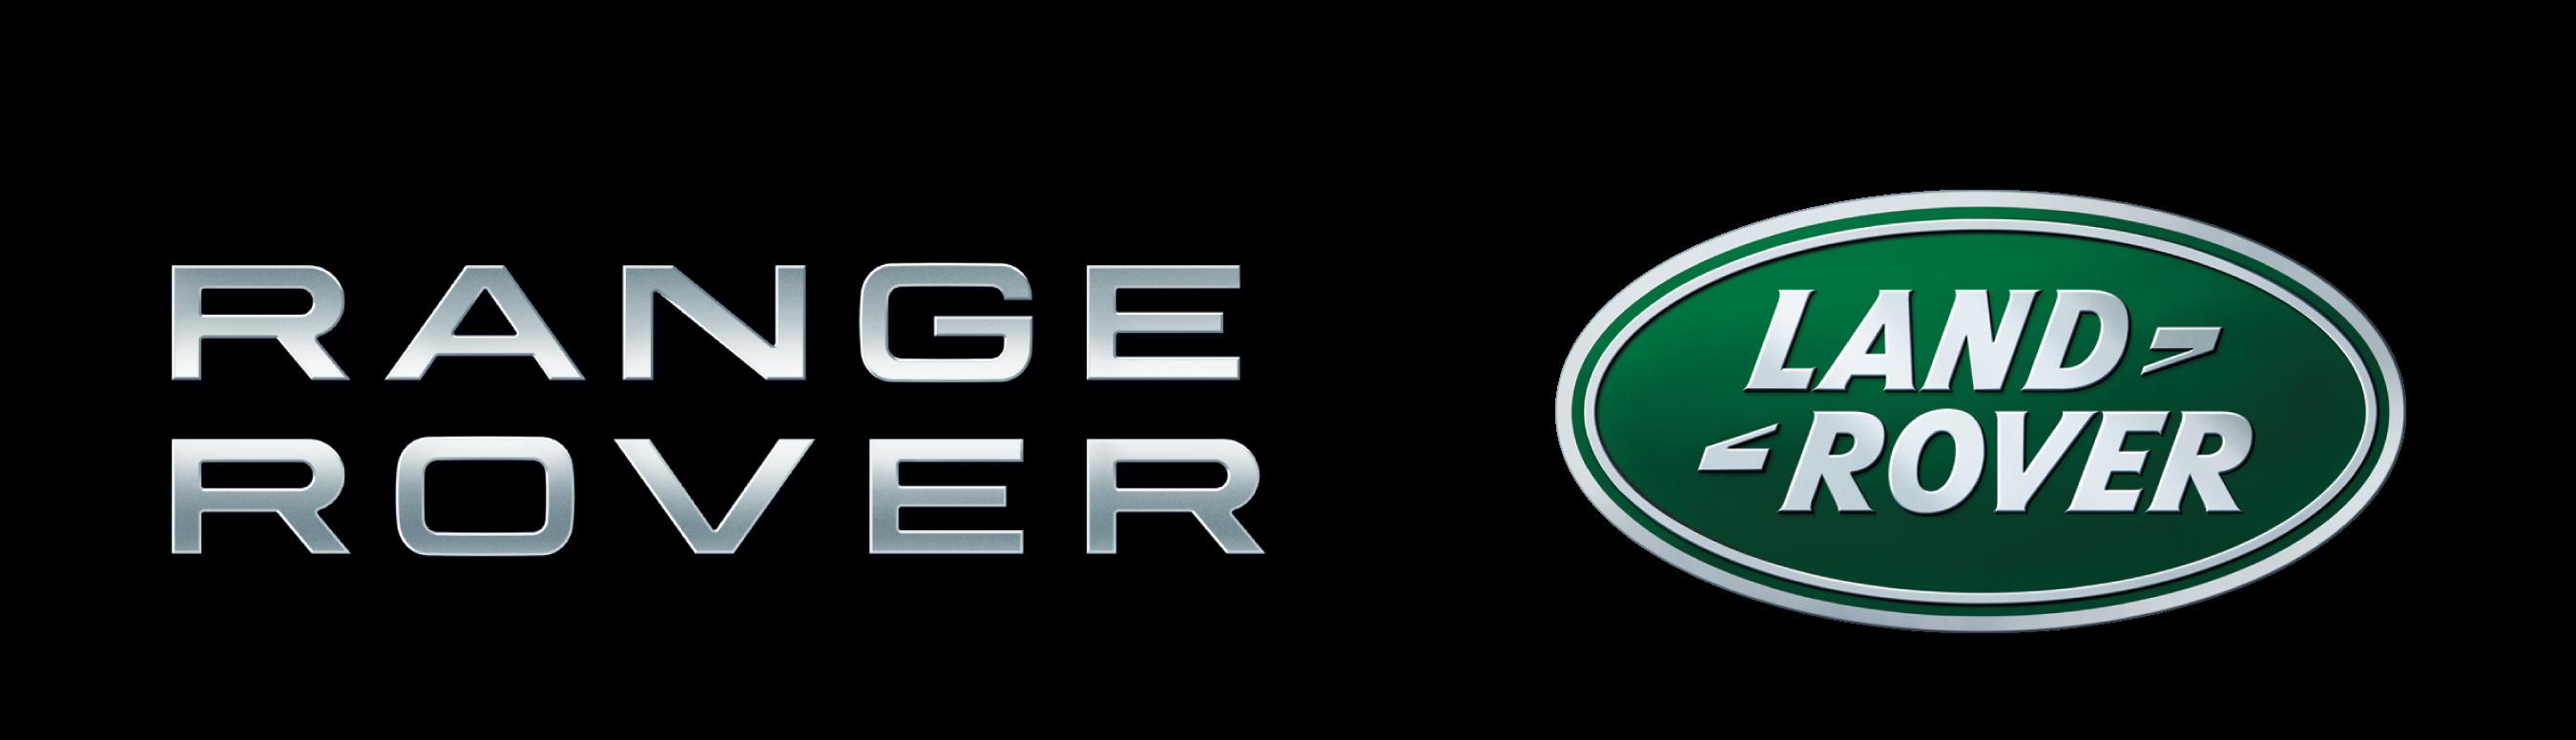 17+] Land Rover Logo Wallpapers on WallpaperSafari.